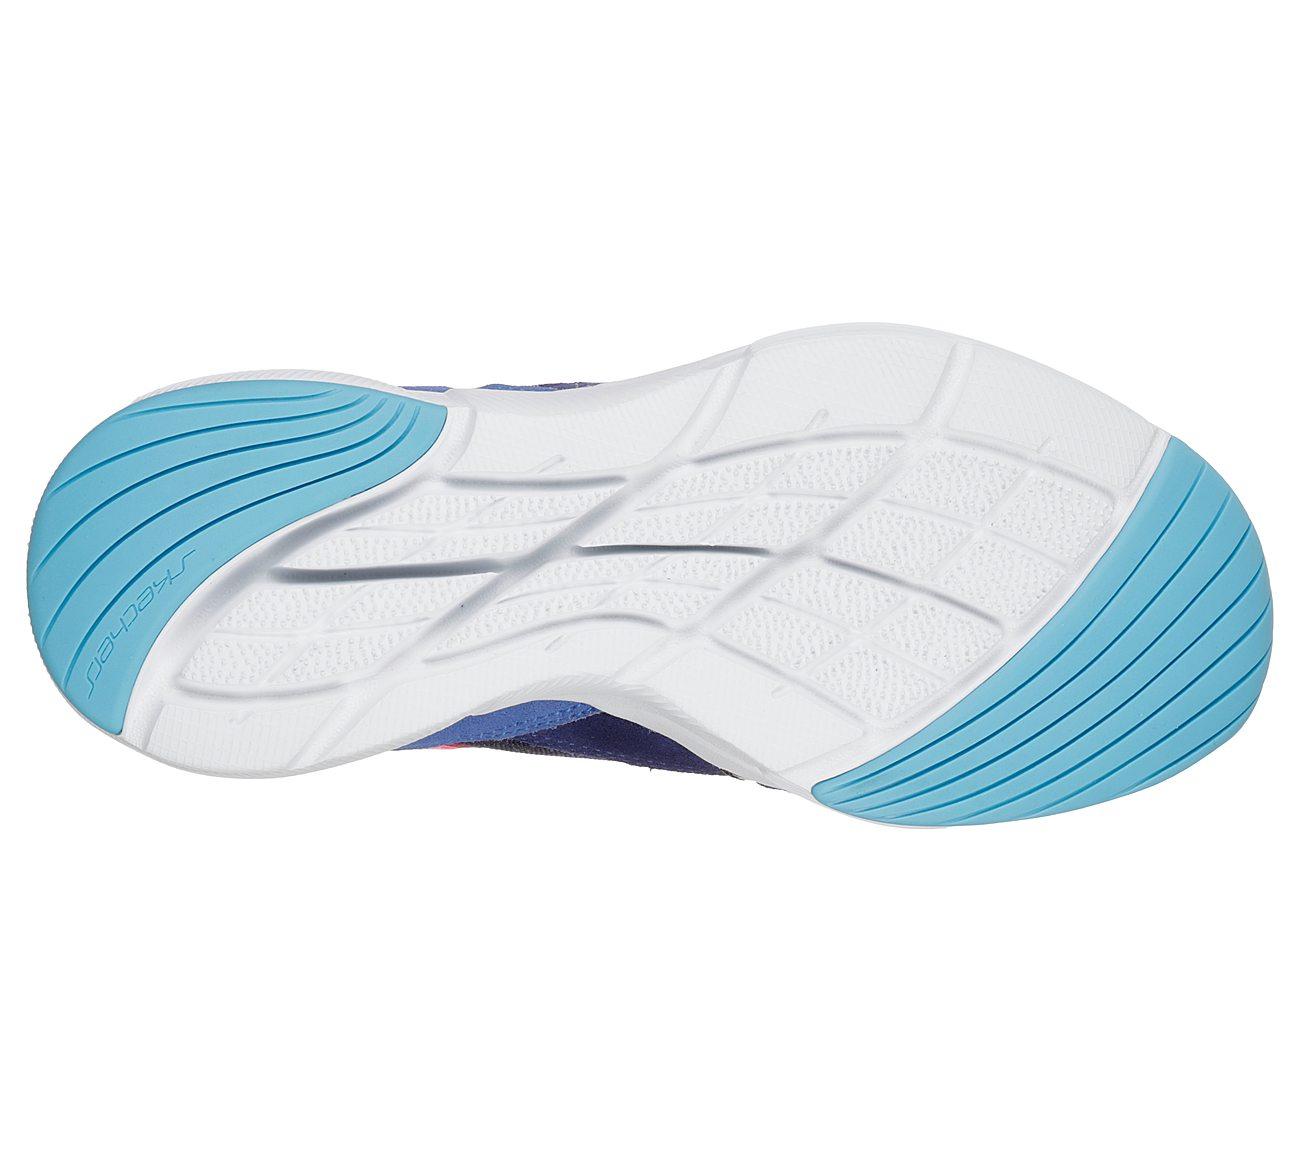 100e271d6aeaa Buy SKECHERS Meridian - No Worries Sport Shoes only 70